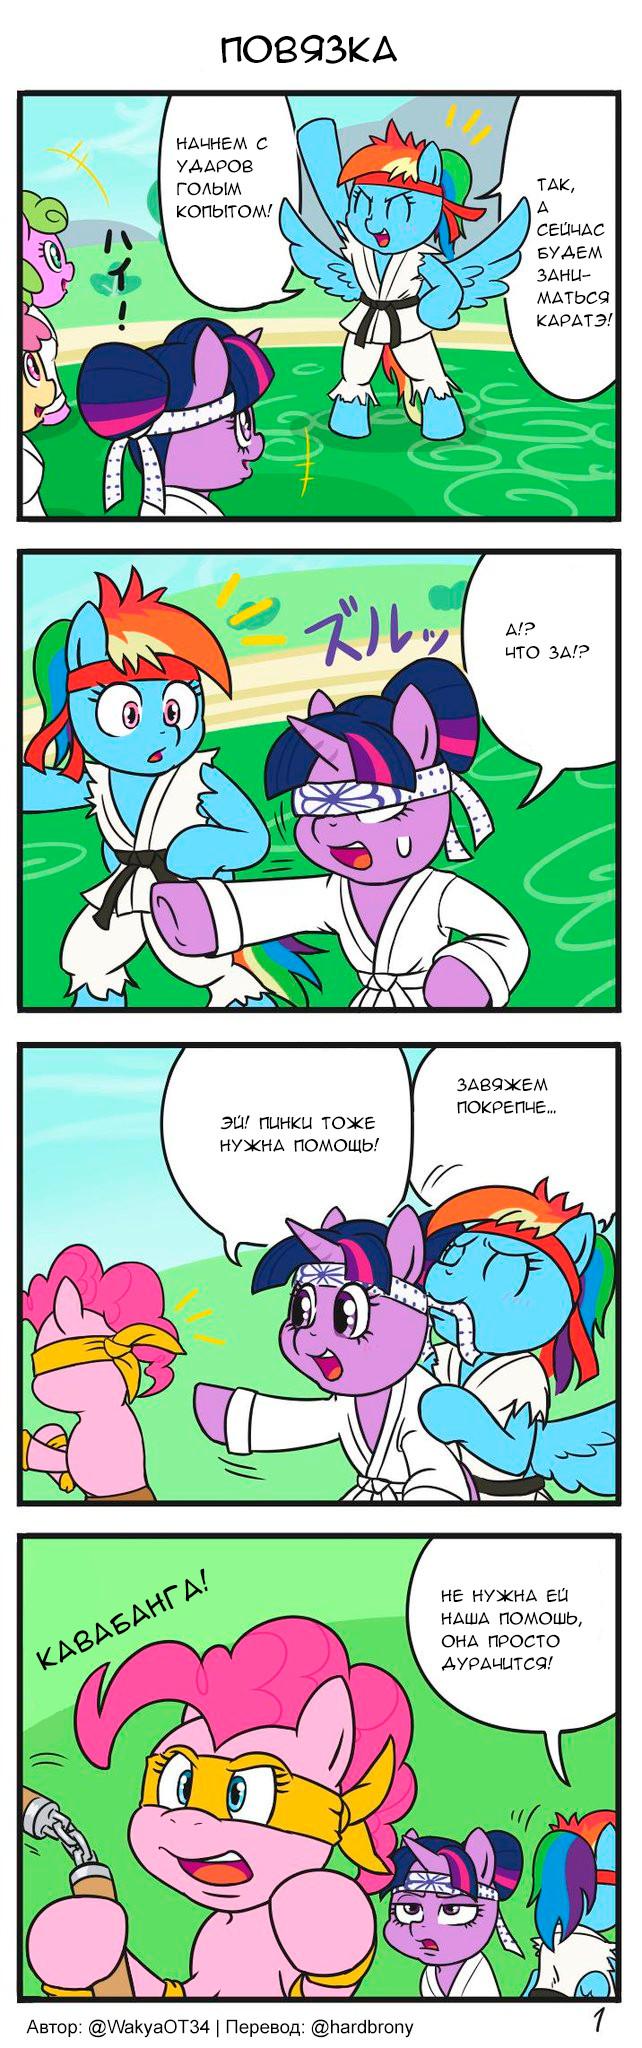 Понячьих комиксов маленькая пачка My Little Pony, Rainbow Dash, Twilight Sparkle, Pinkie Pie, Карате, Длиннопост, Додзинси